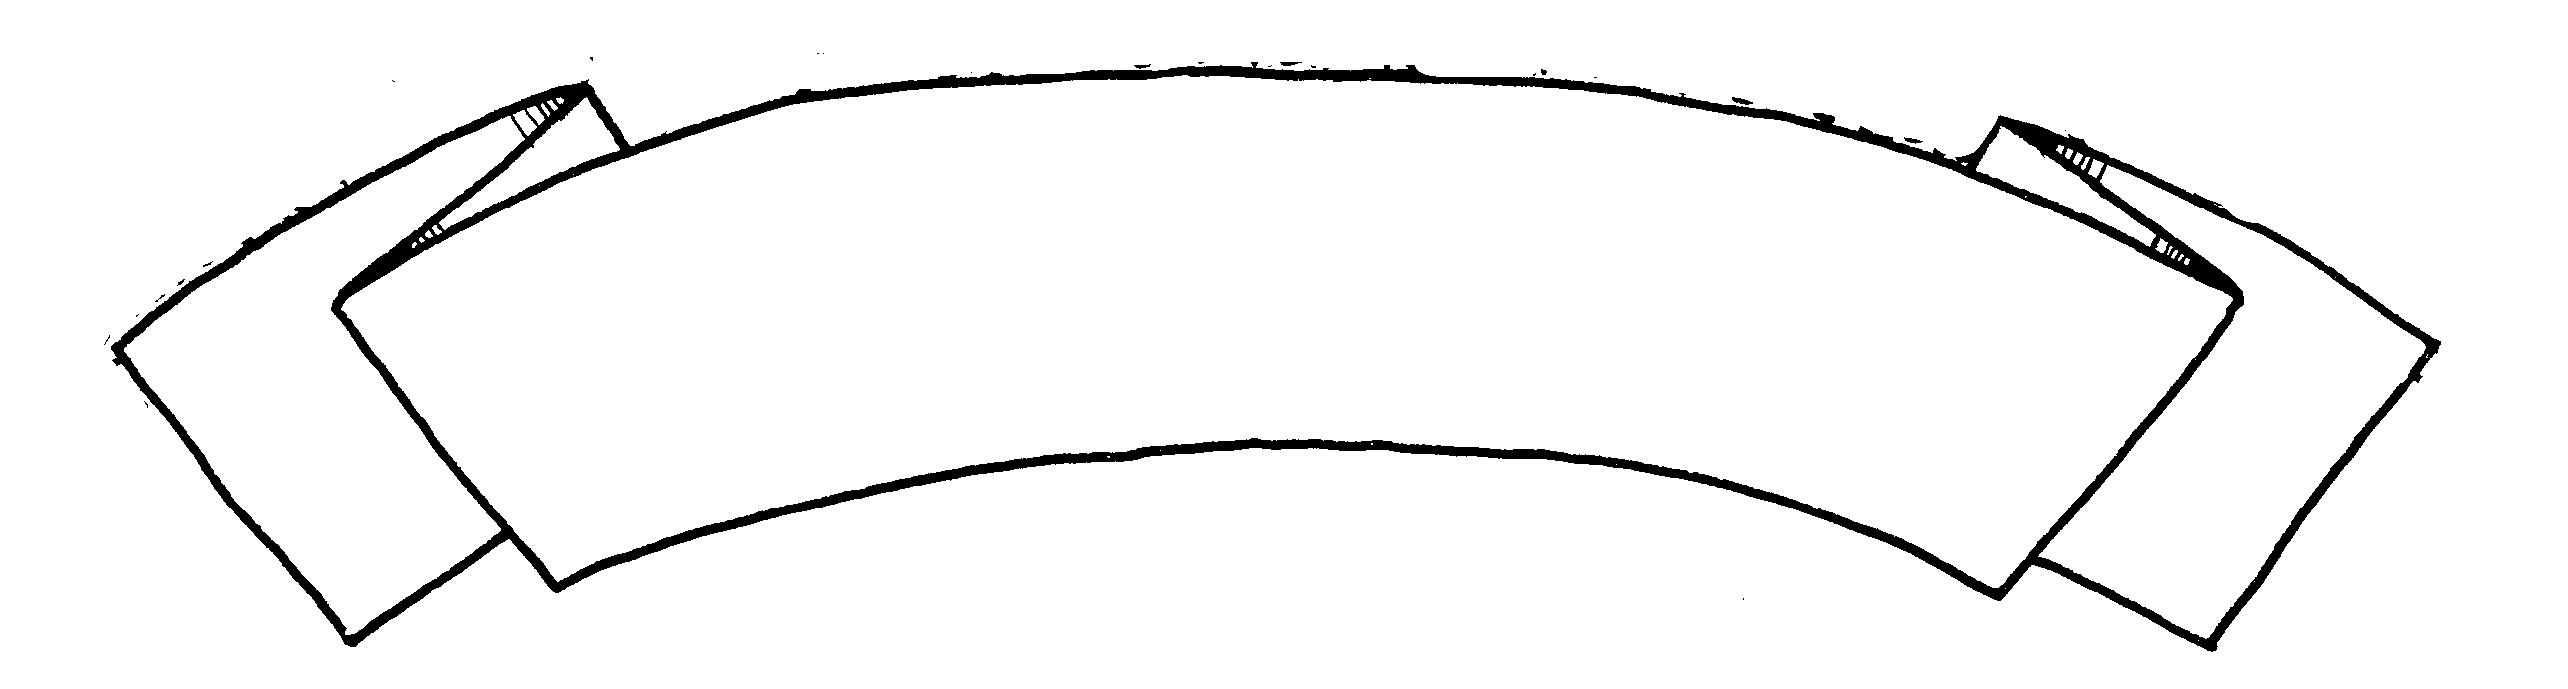 Blank Banner Clipart - Clipart Kid